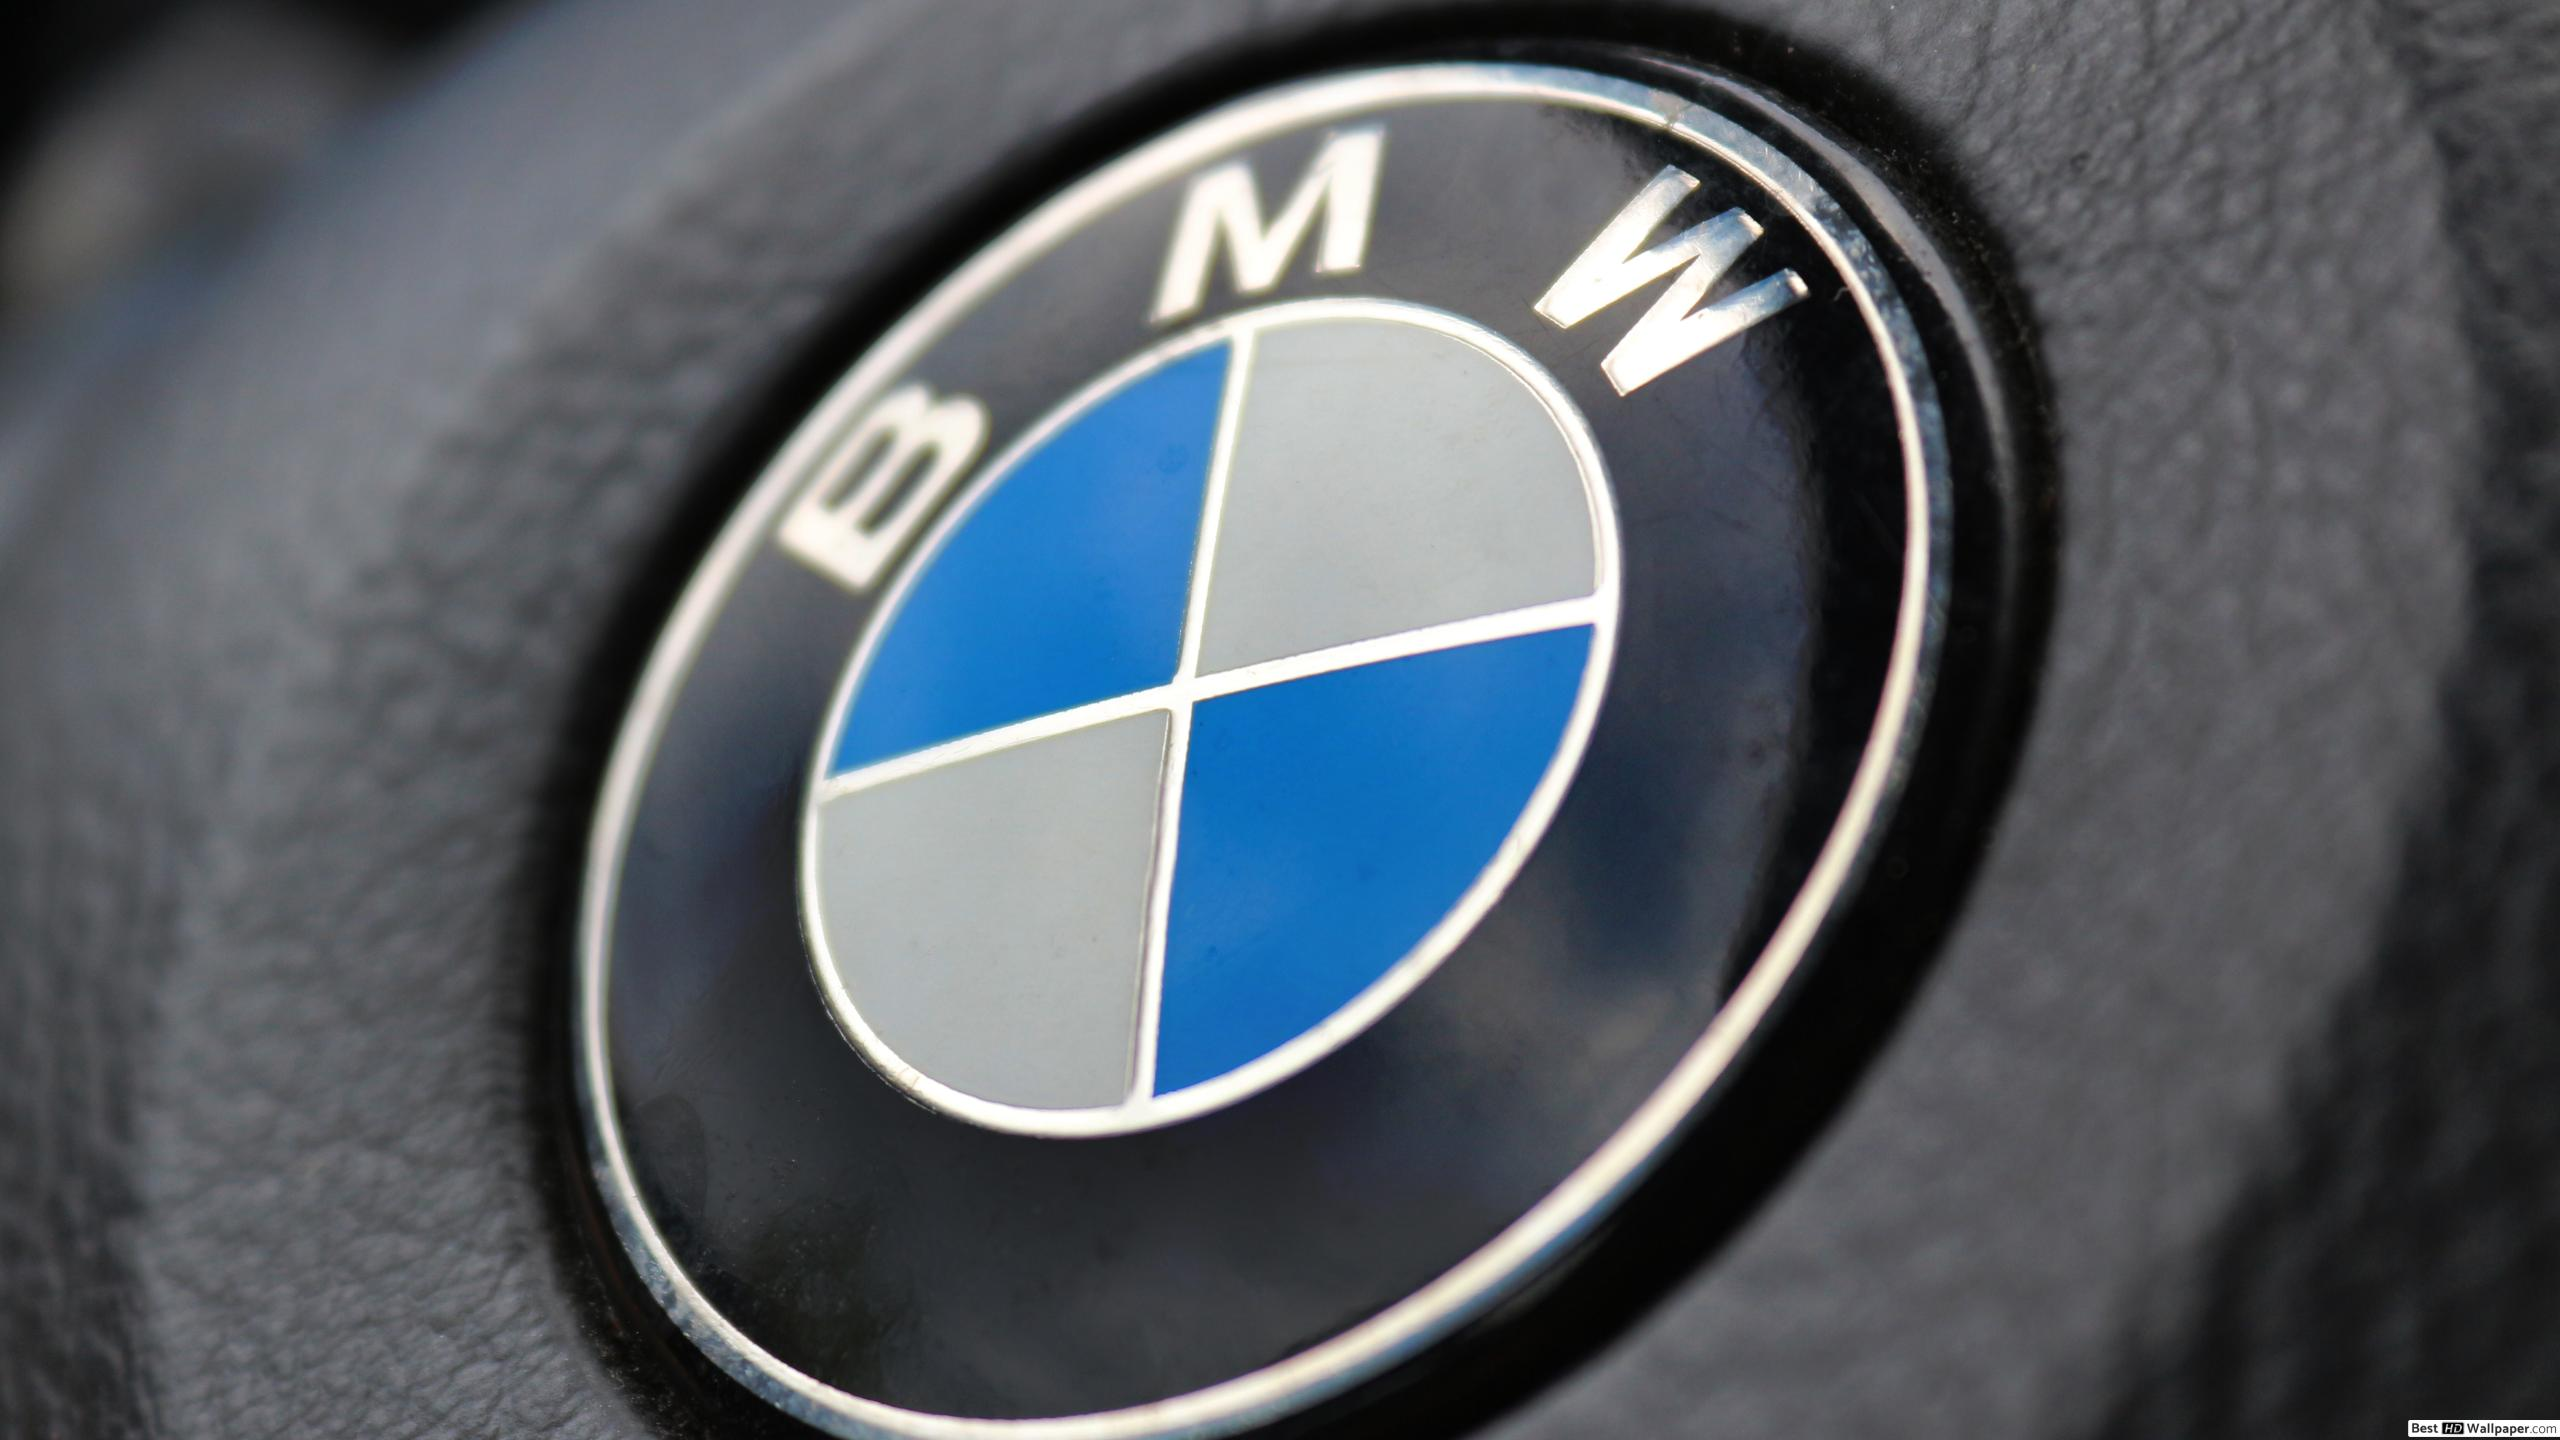 Bmw Logo Hd Posted By Sarah Cunningham